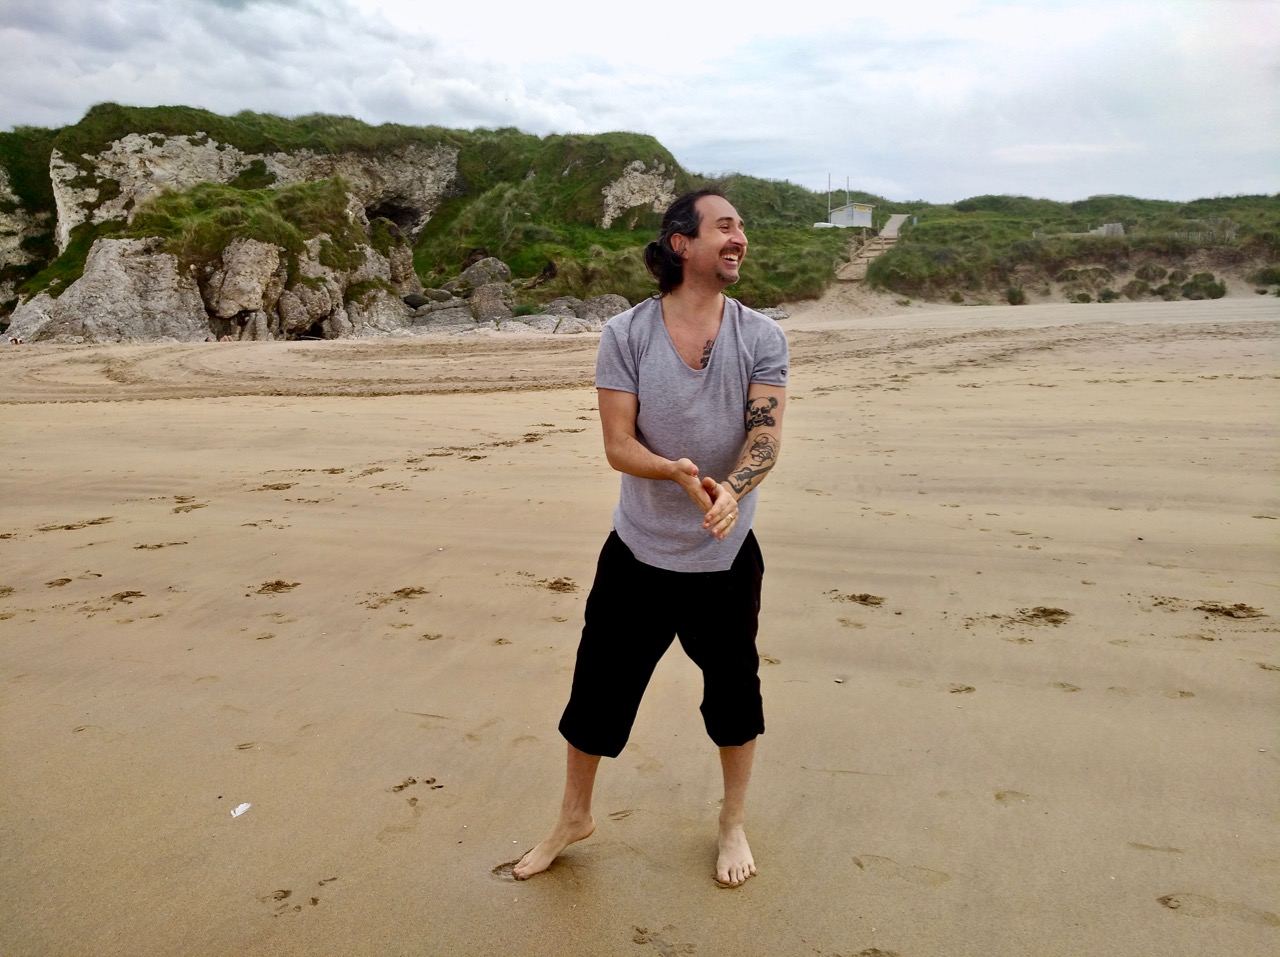 day trip to the beach from Belfast : Whiterocks beach in Portrush (18)